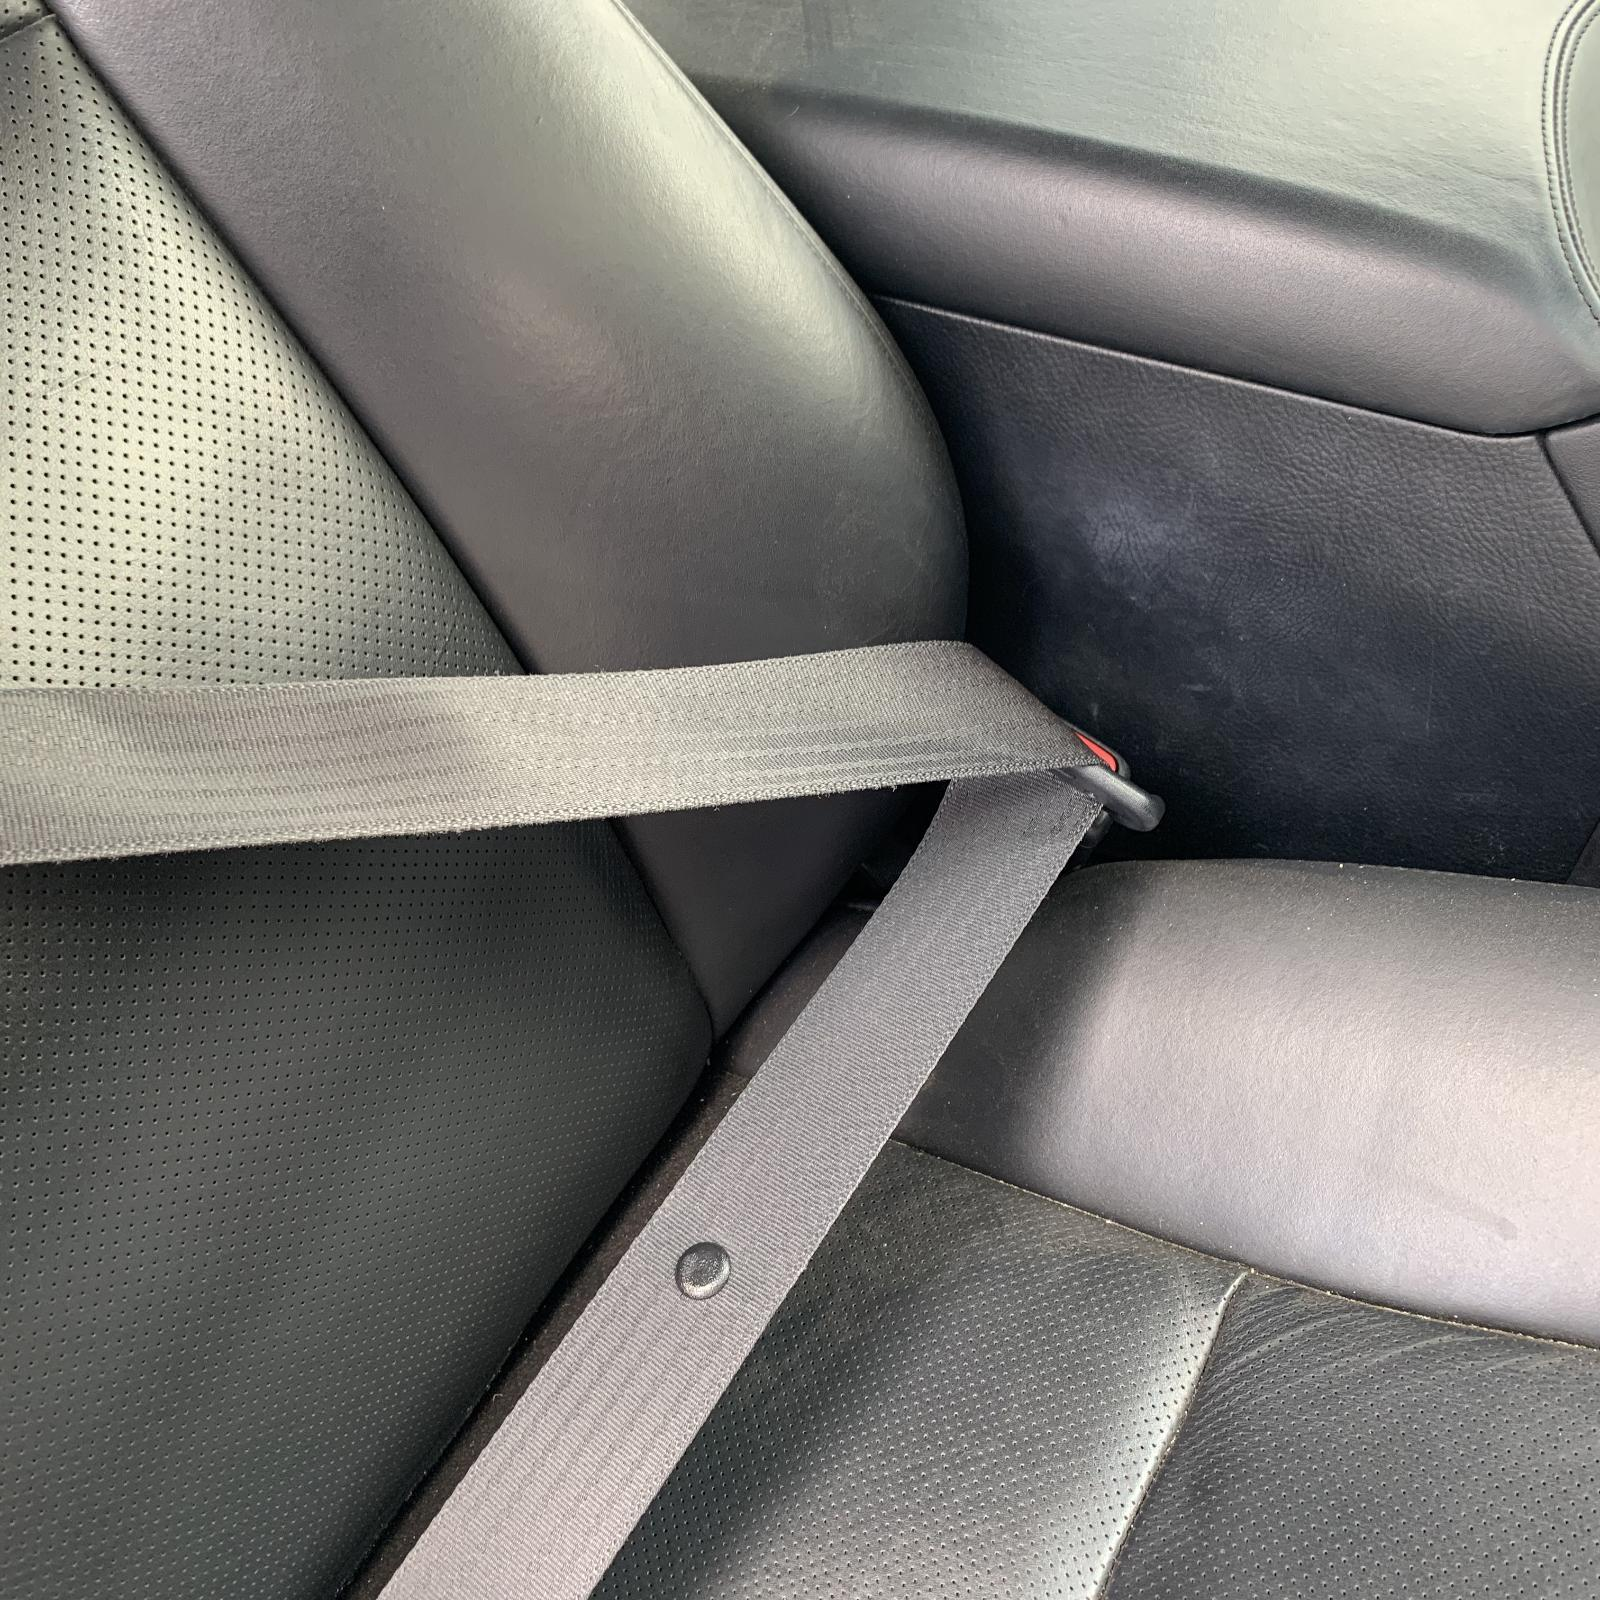 LEXUS LS460, Seatbelt/Stalk, RH FRONT, SEAT BELT ONLY, BLACK, 40 SERIES, 08/06-11/09